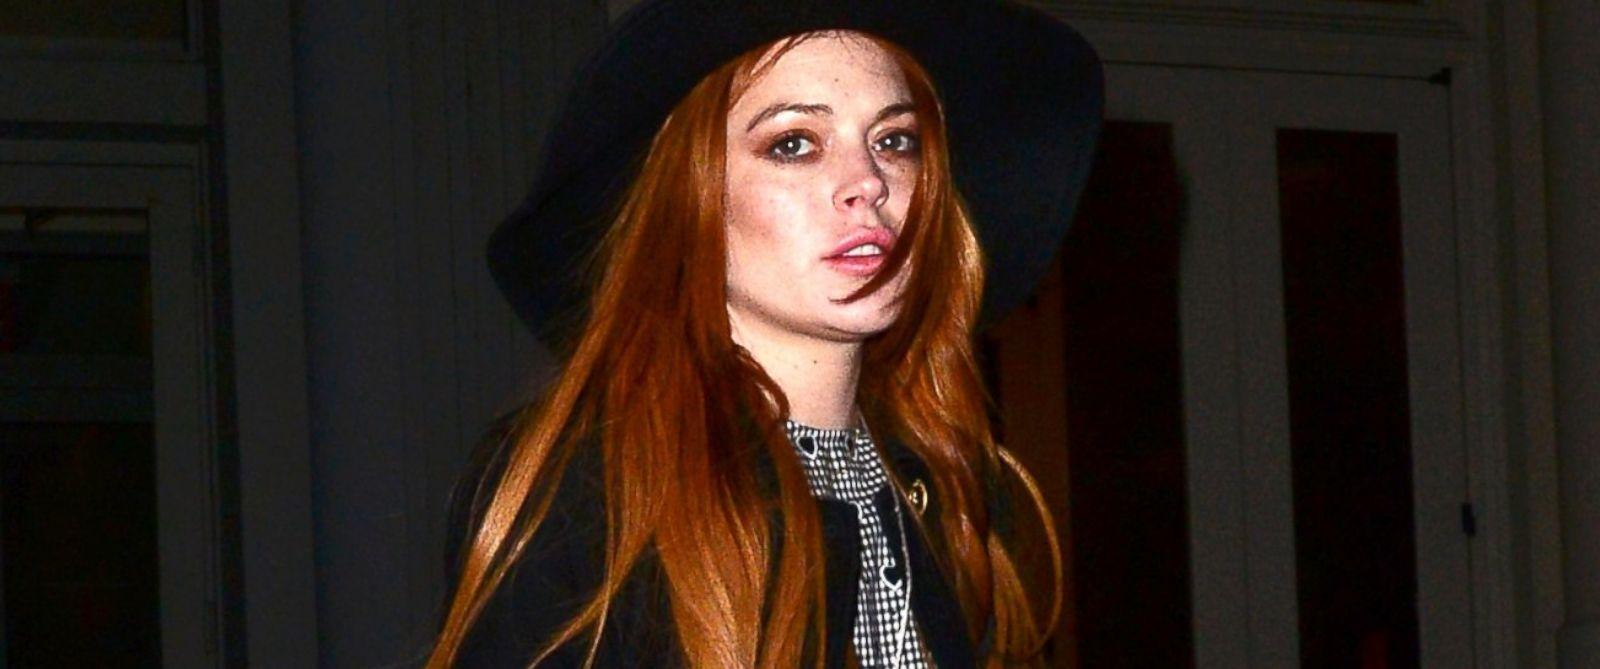 PHOTO: Lindsay Lohan is seen walking in SoHo, April 9, 2014 in New York.